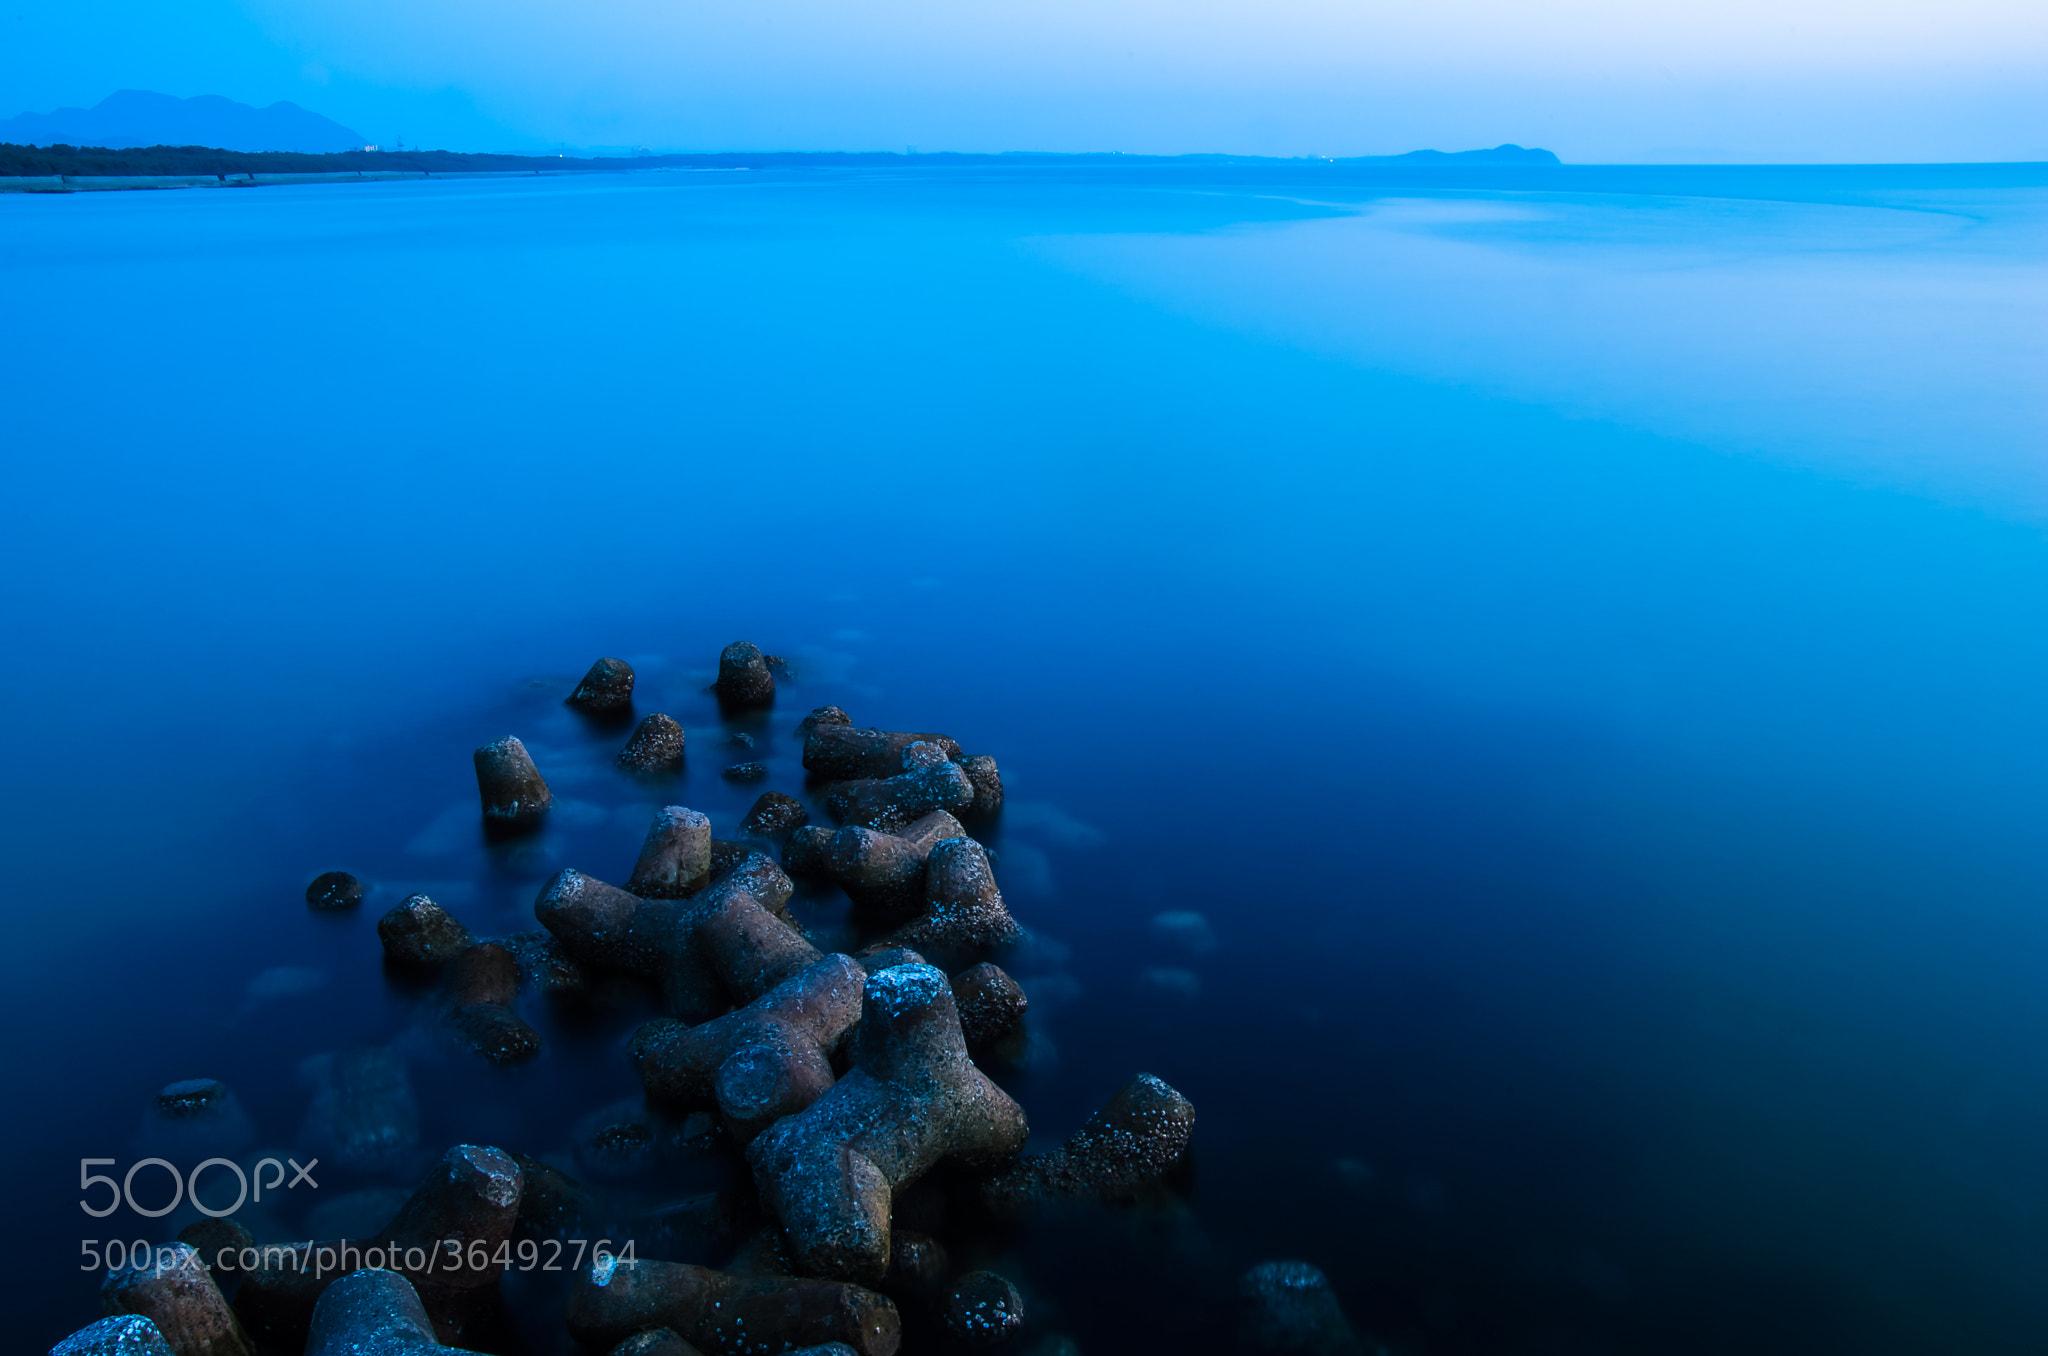 Photograph Blue by Sachiko Kawakami on 500px